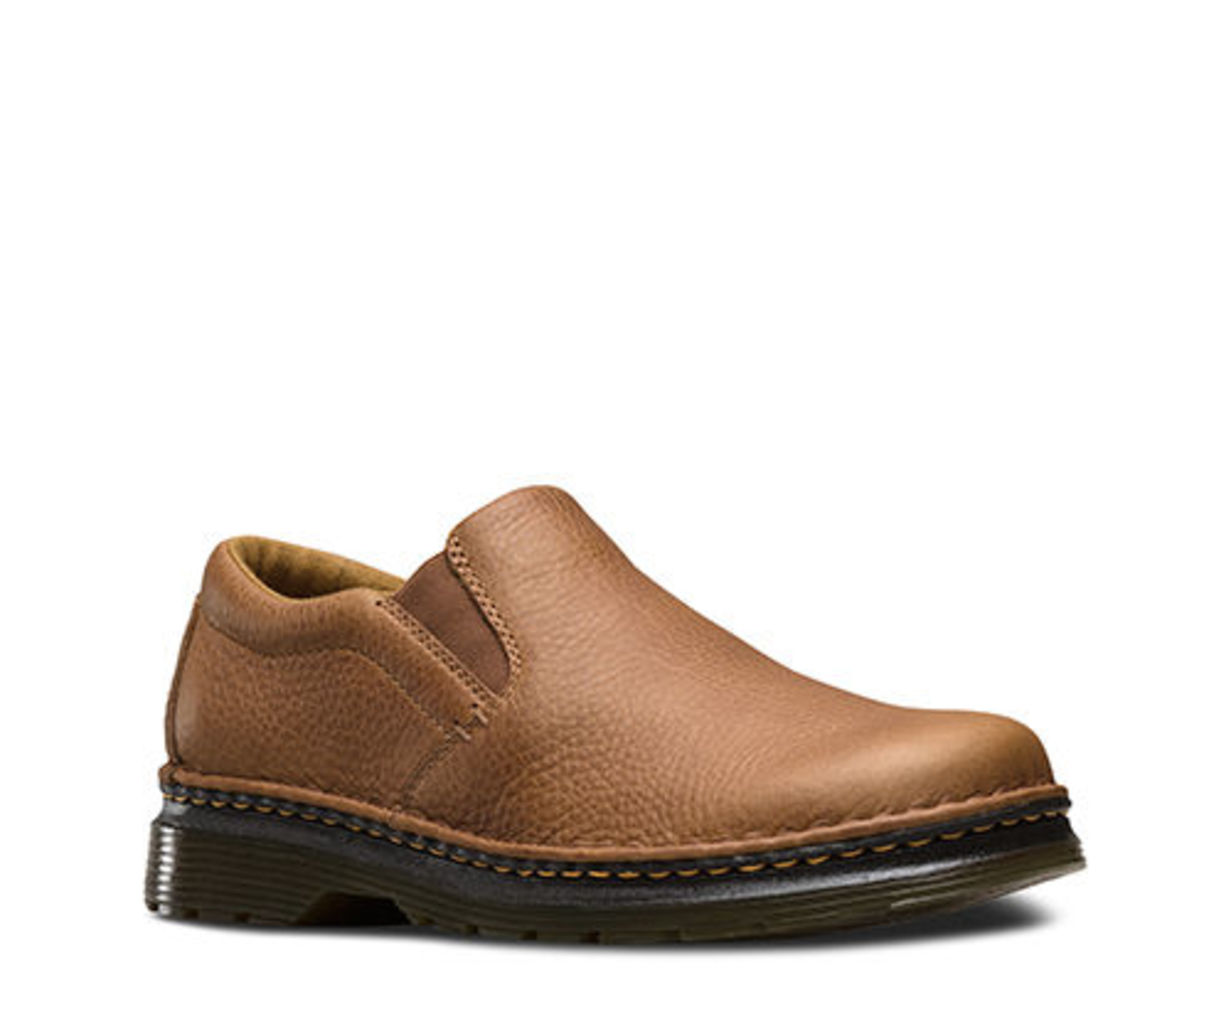 Boyle Shoe